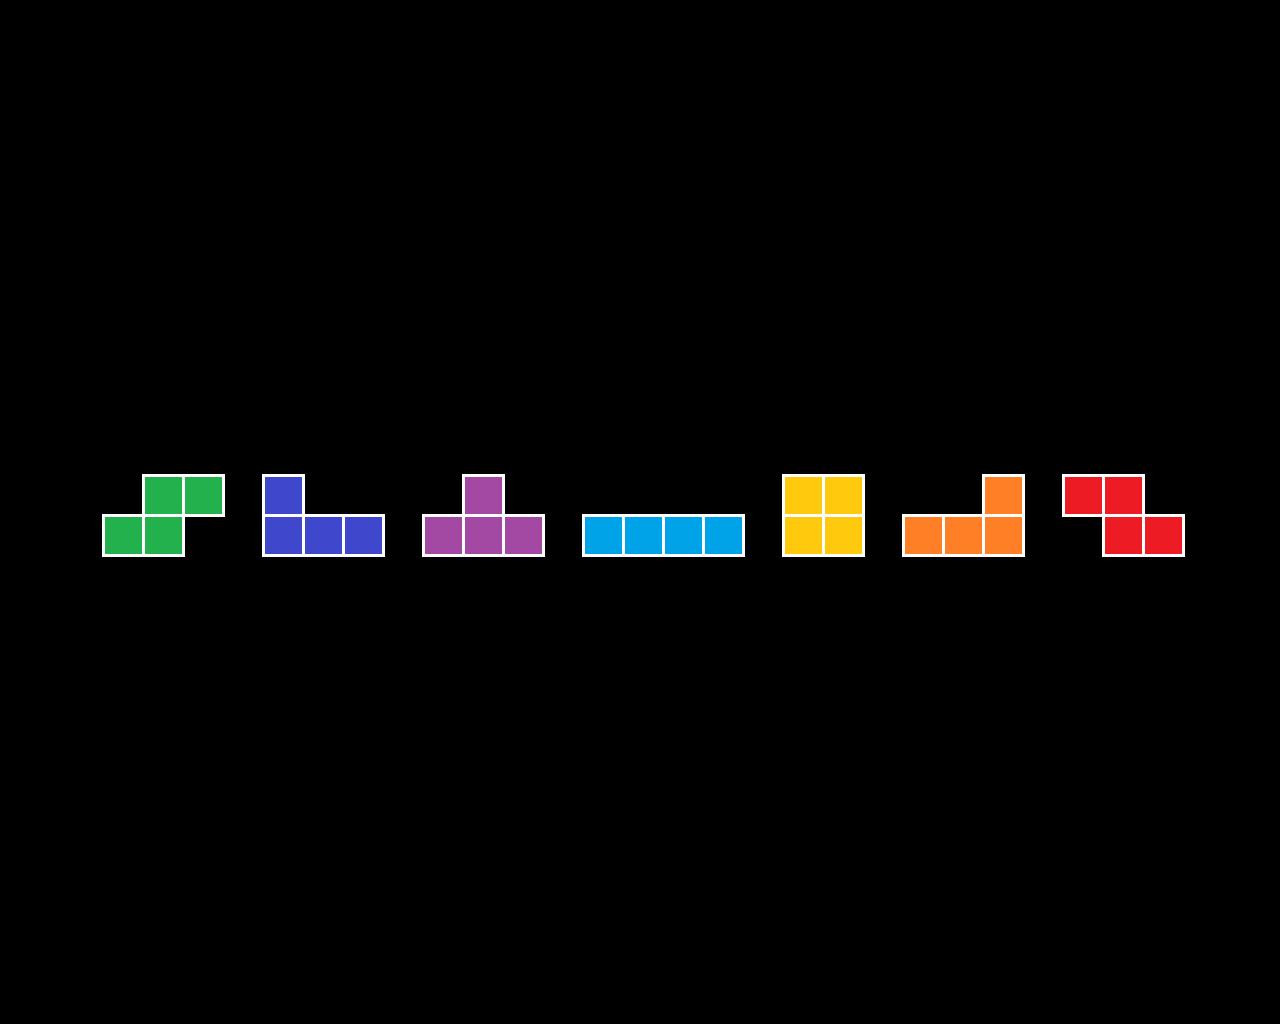 Tetris Wallpapers HT435V4   4USkY 1280x1024